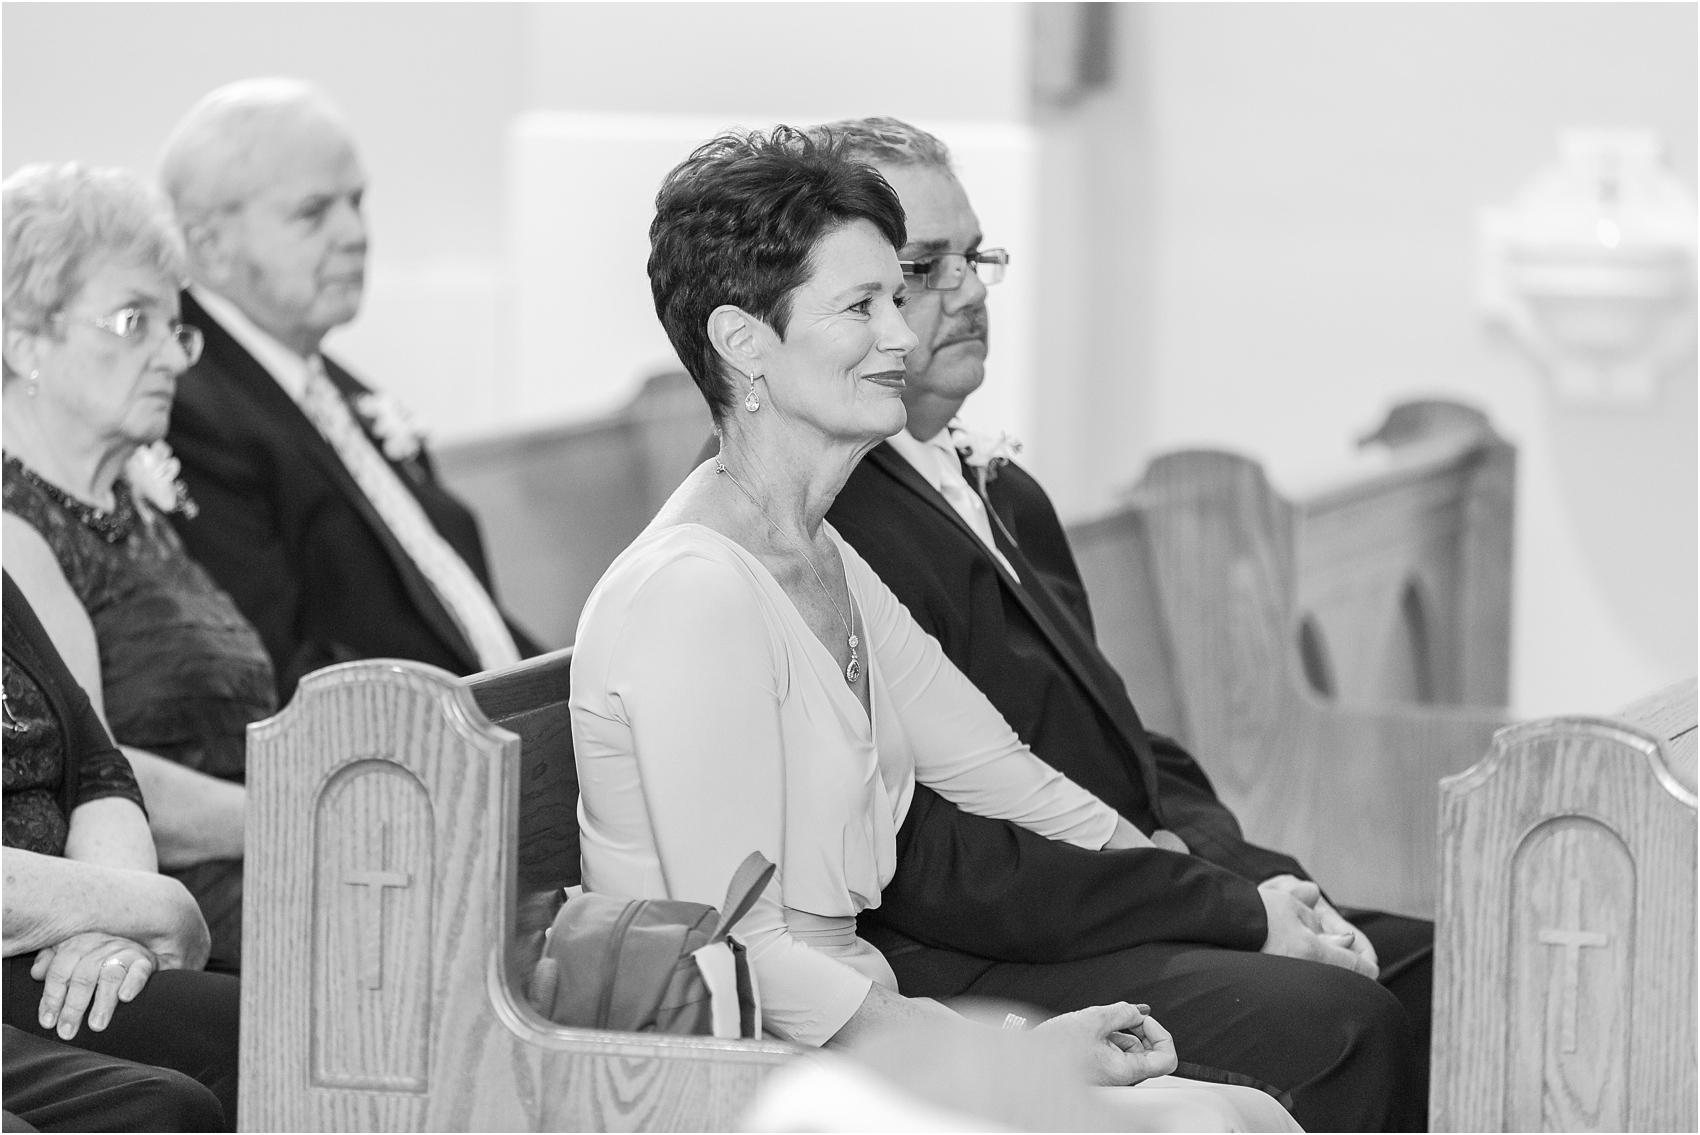 elegant-and-romantic-fall-wedding-photos-at-st-marys-catholic-church-in-monroe-michigan-by-courtney-carolyn-photography_0021.jpg